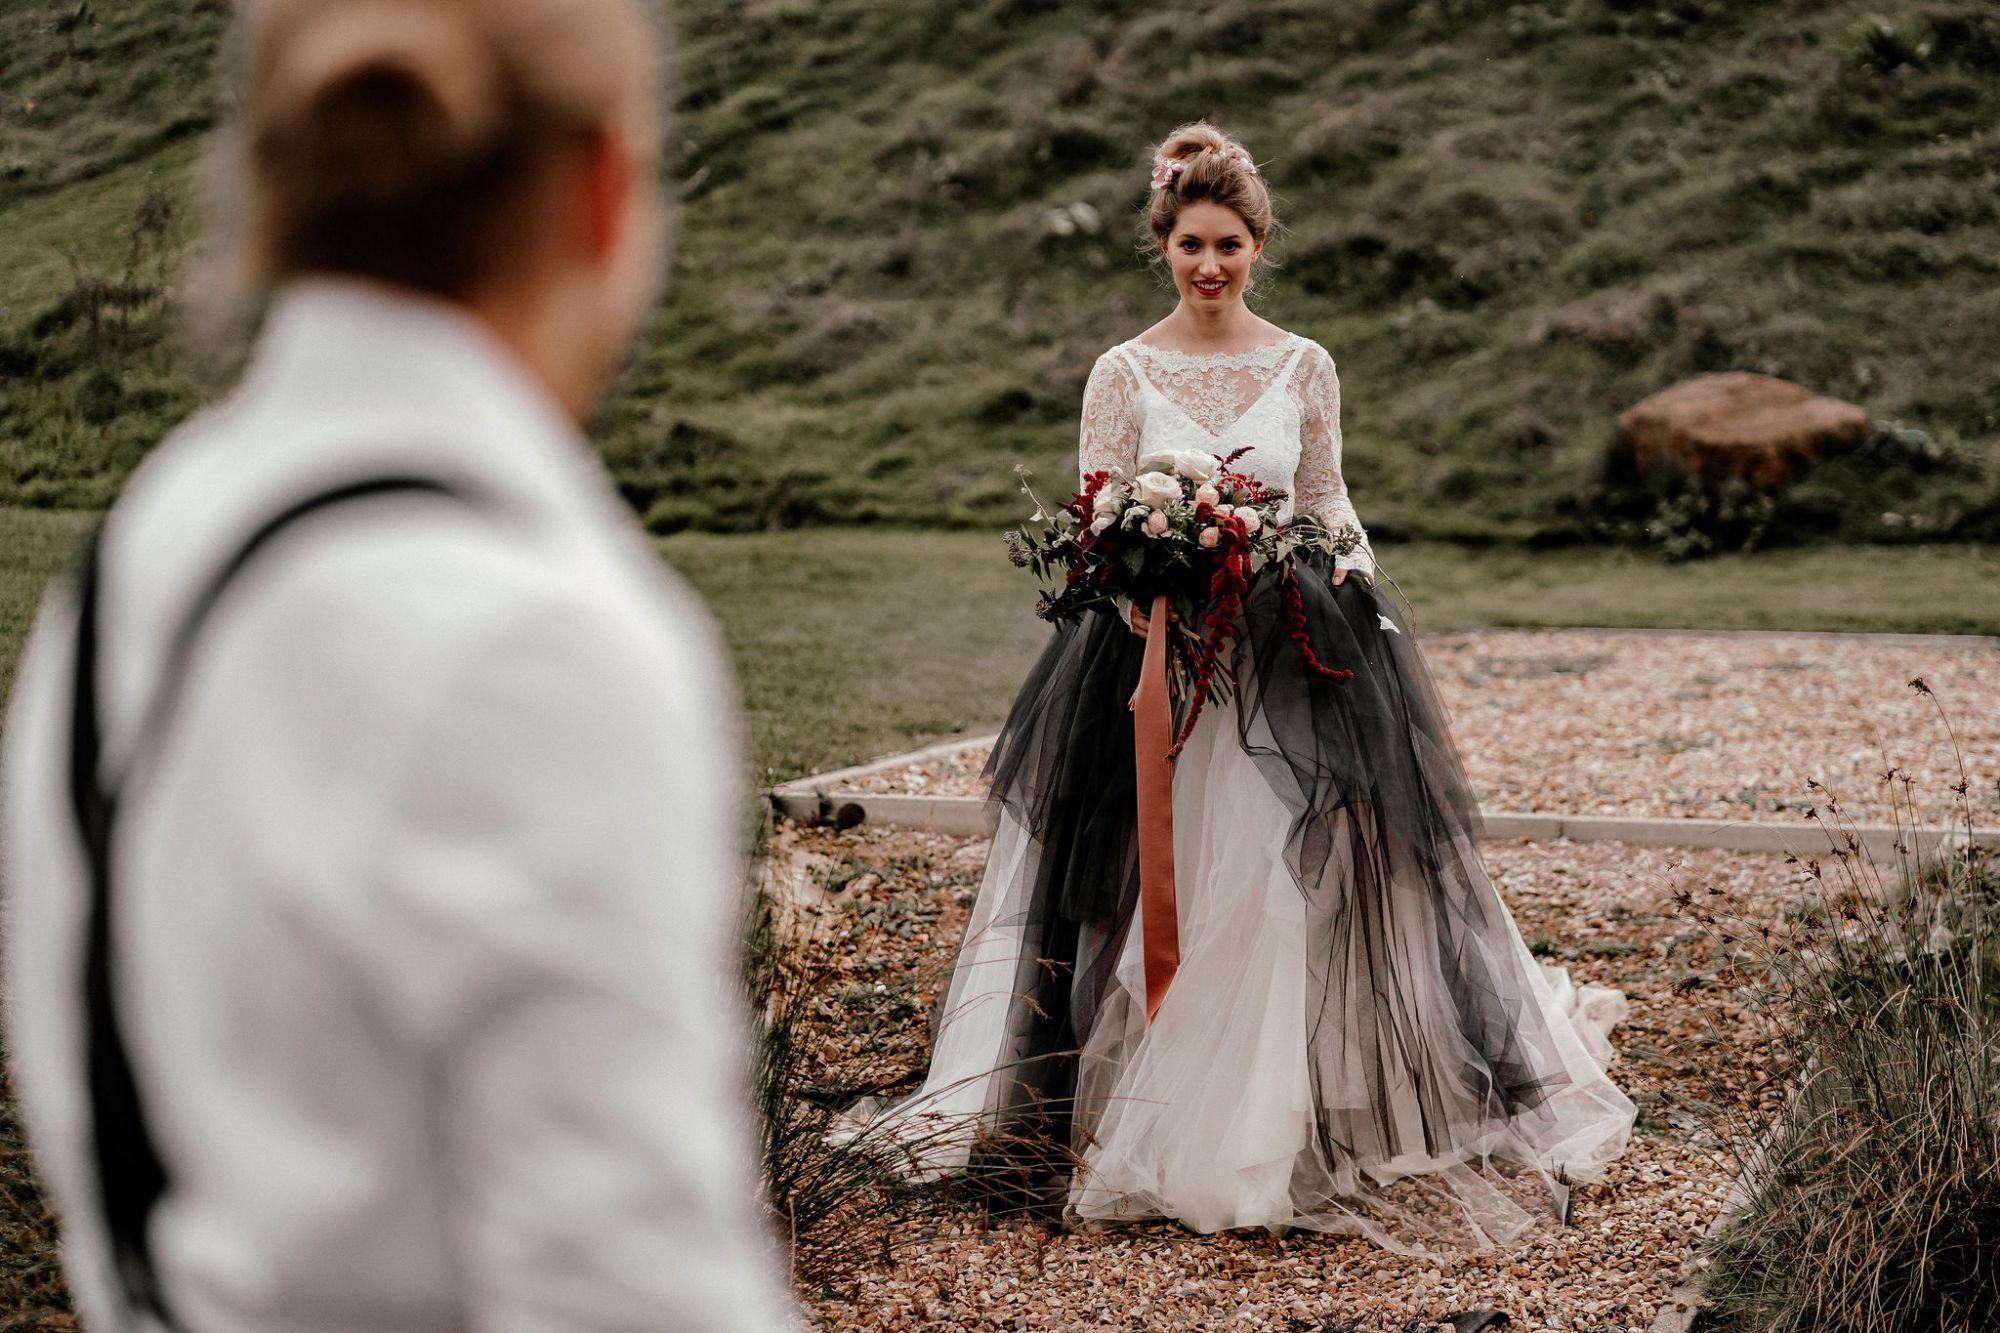 Black_tulle_alternative_wedding_dress